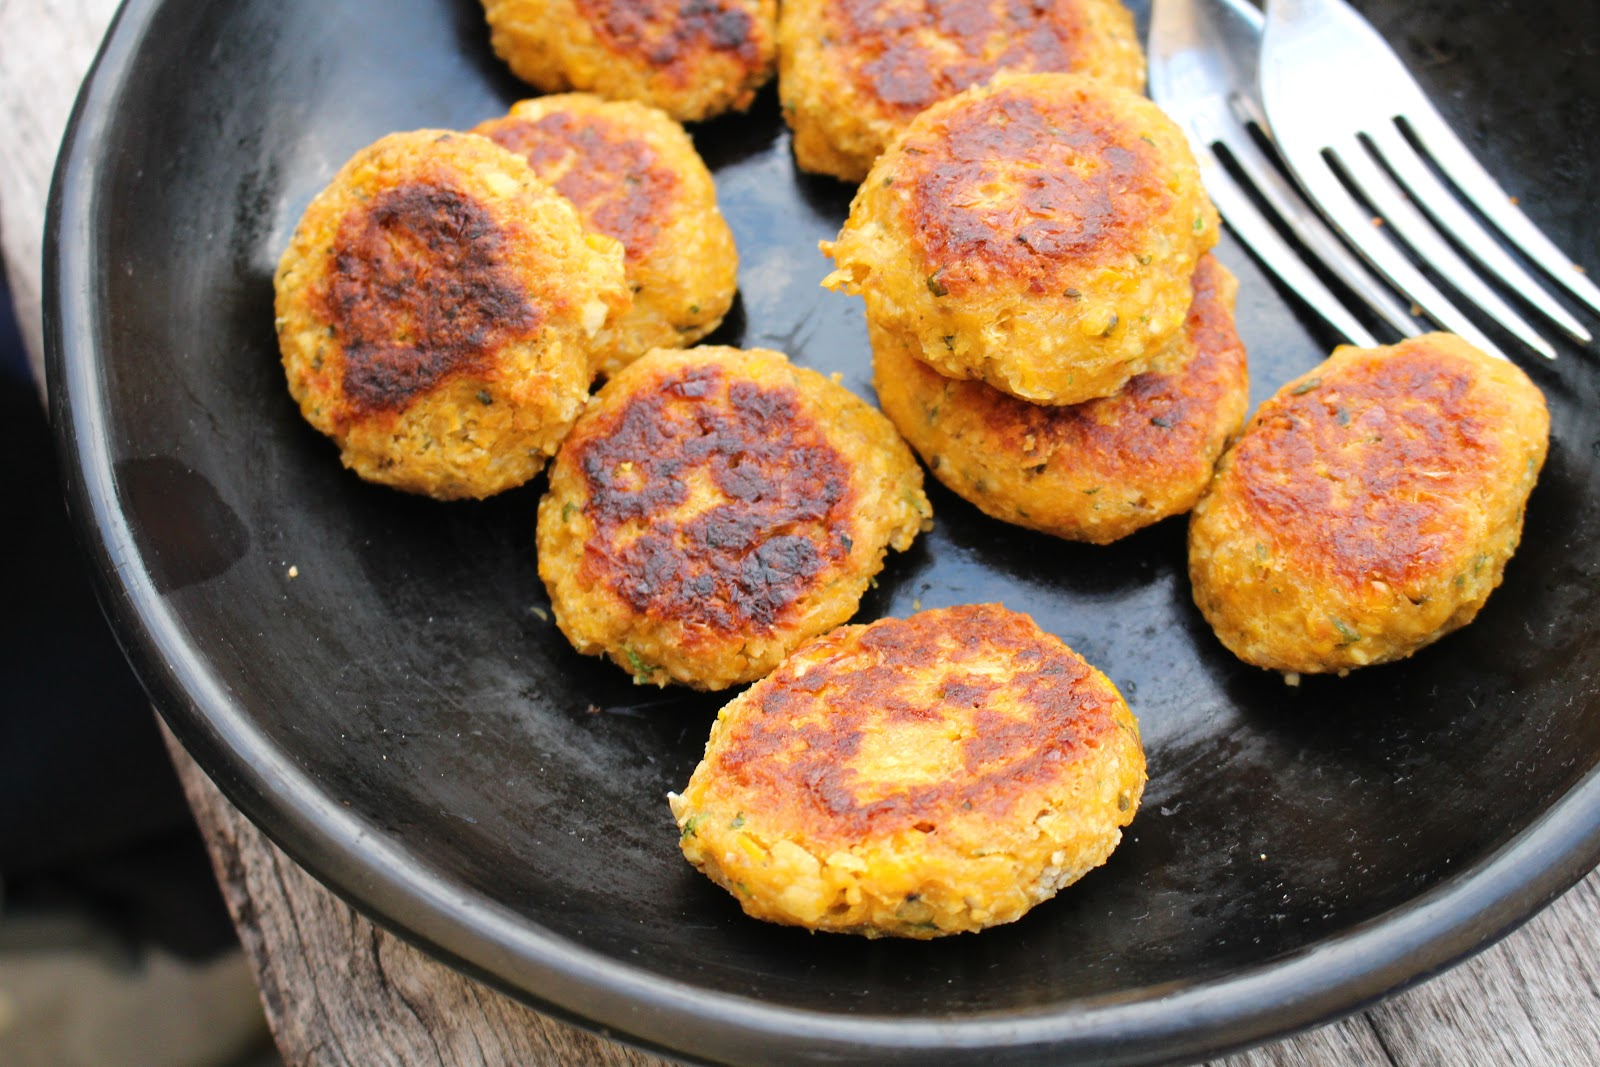 Jamie Oliver Vegan burgers chickpea